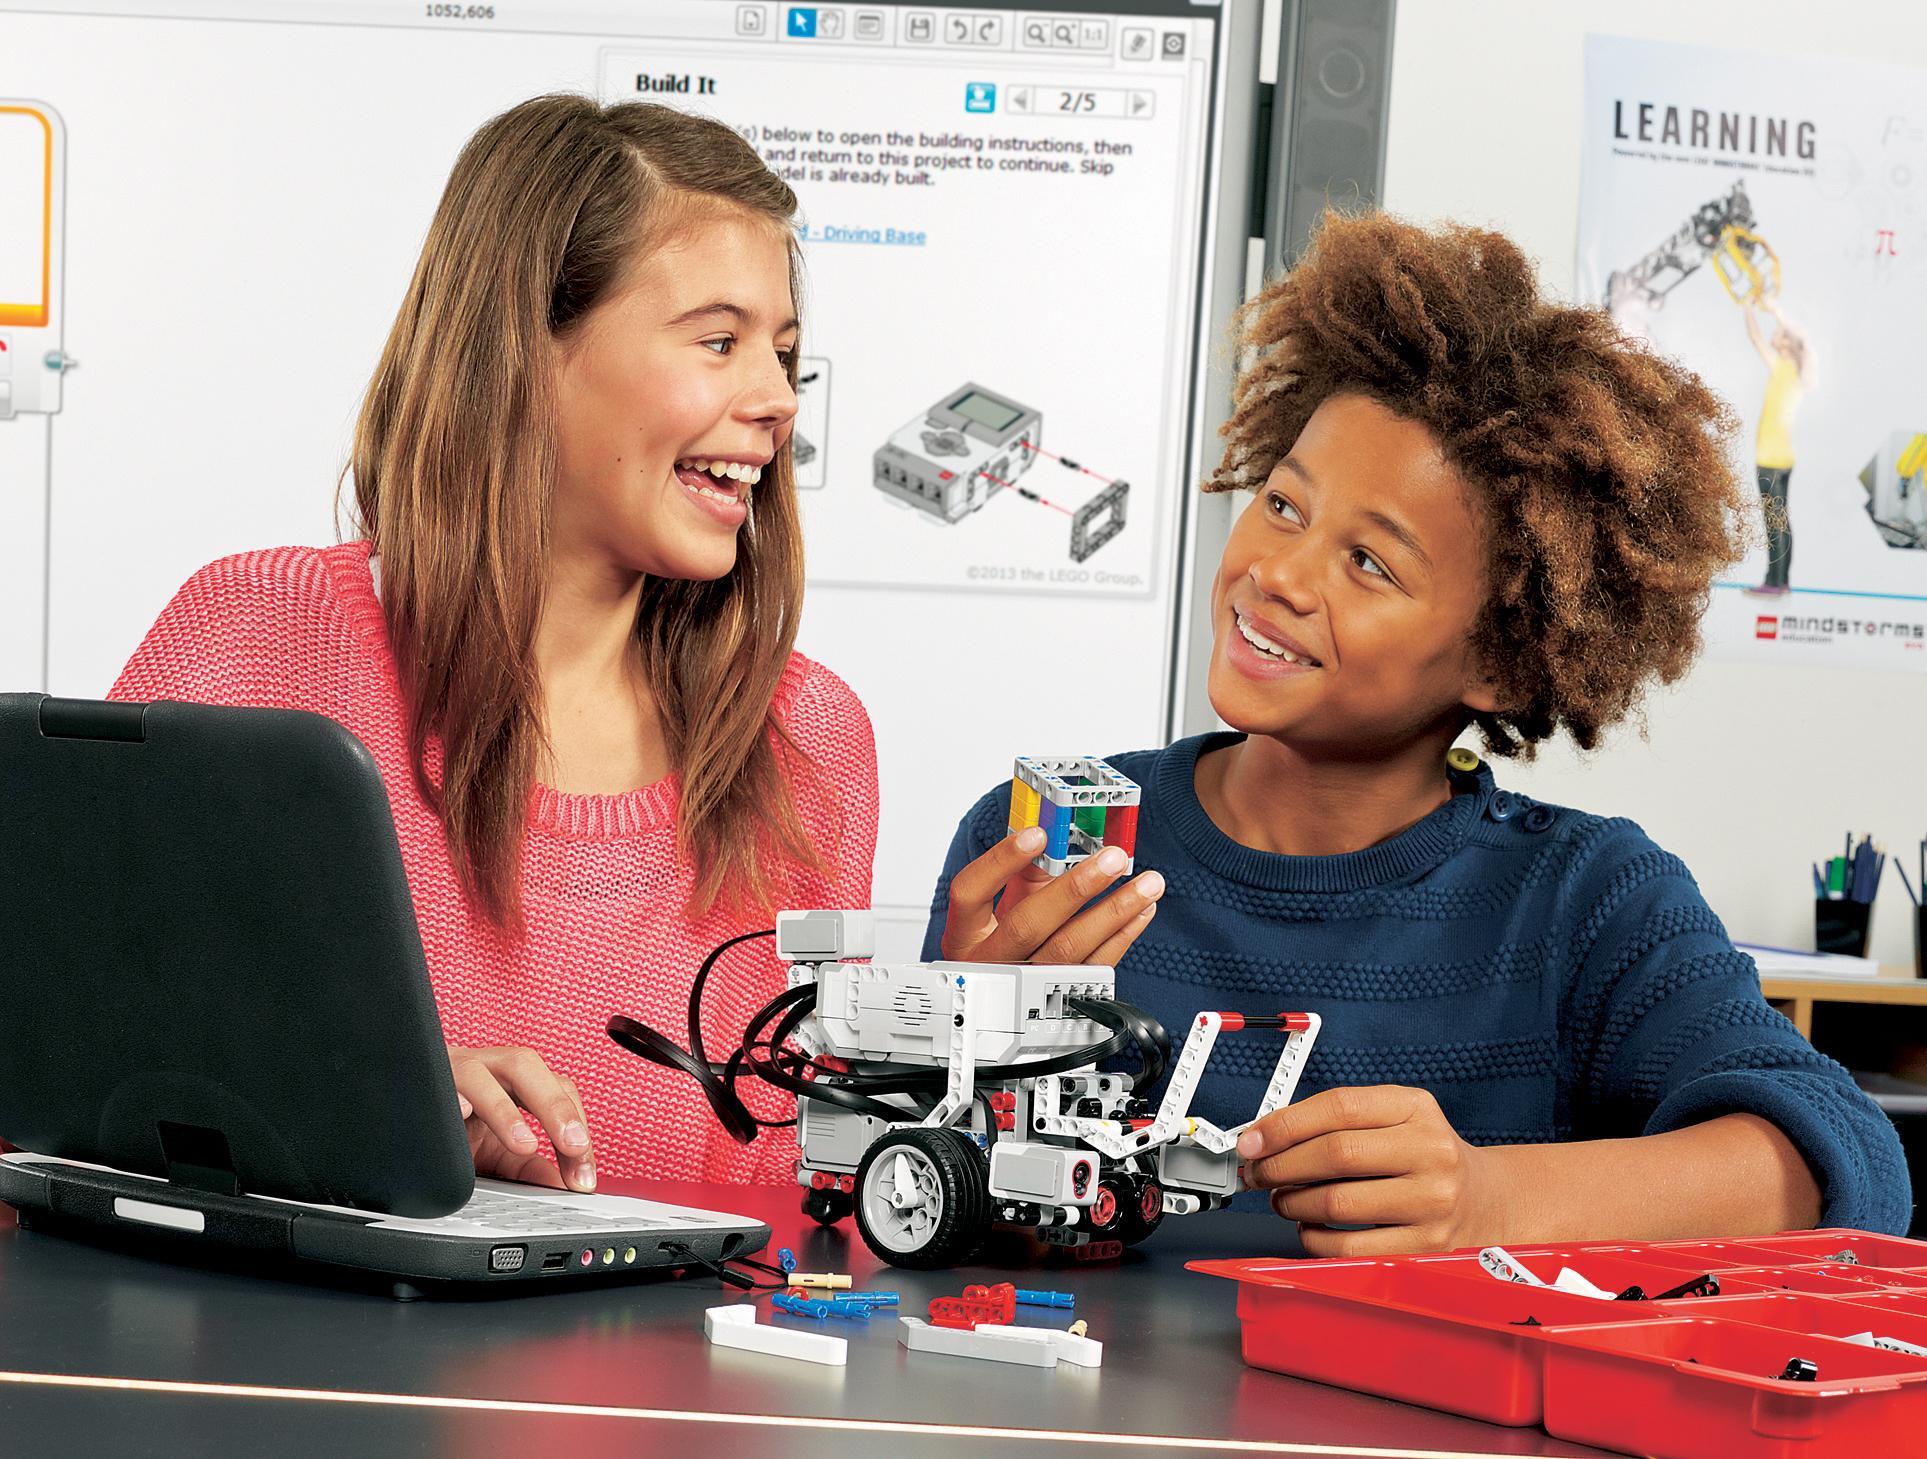 Lego Mindstorms Education Ev3 Platform Available August 1 2013